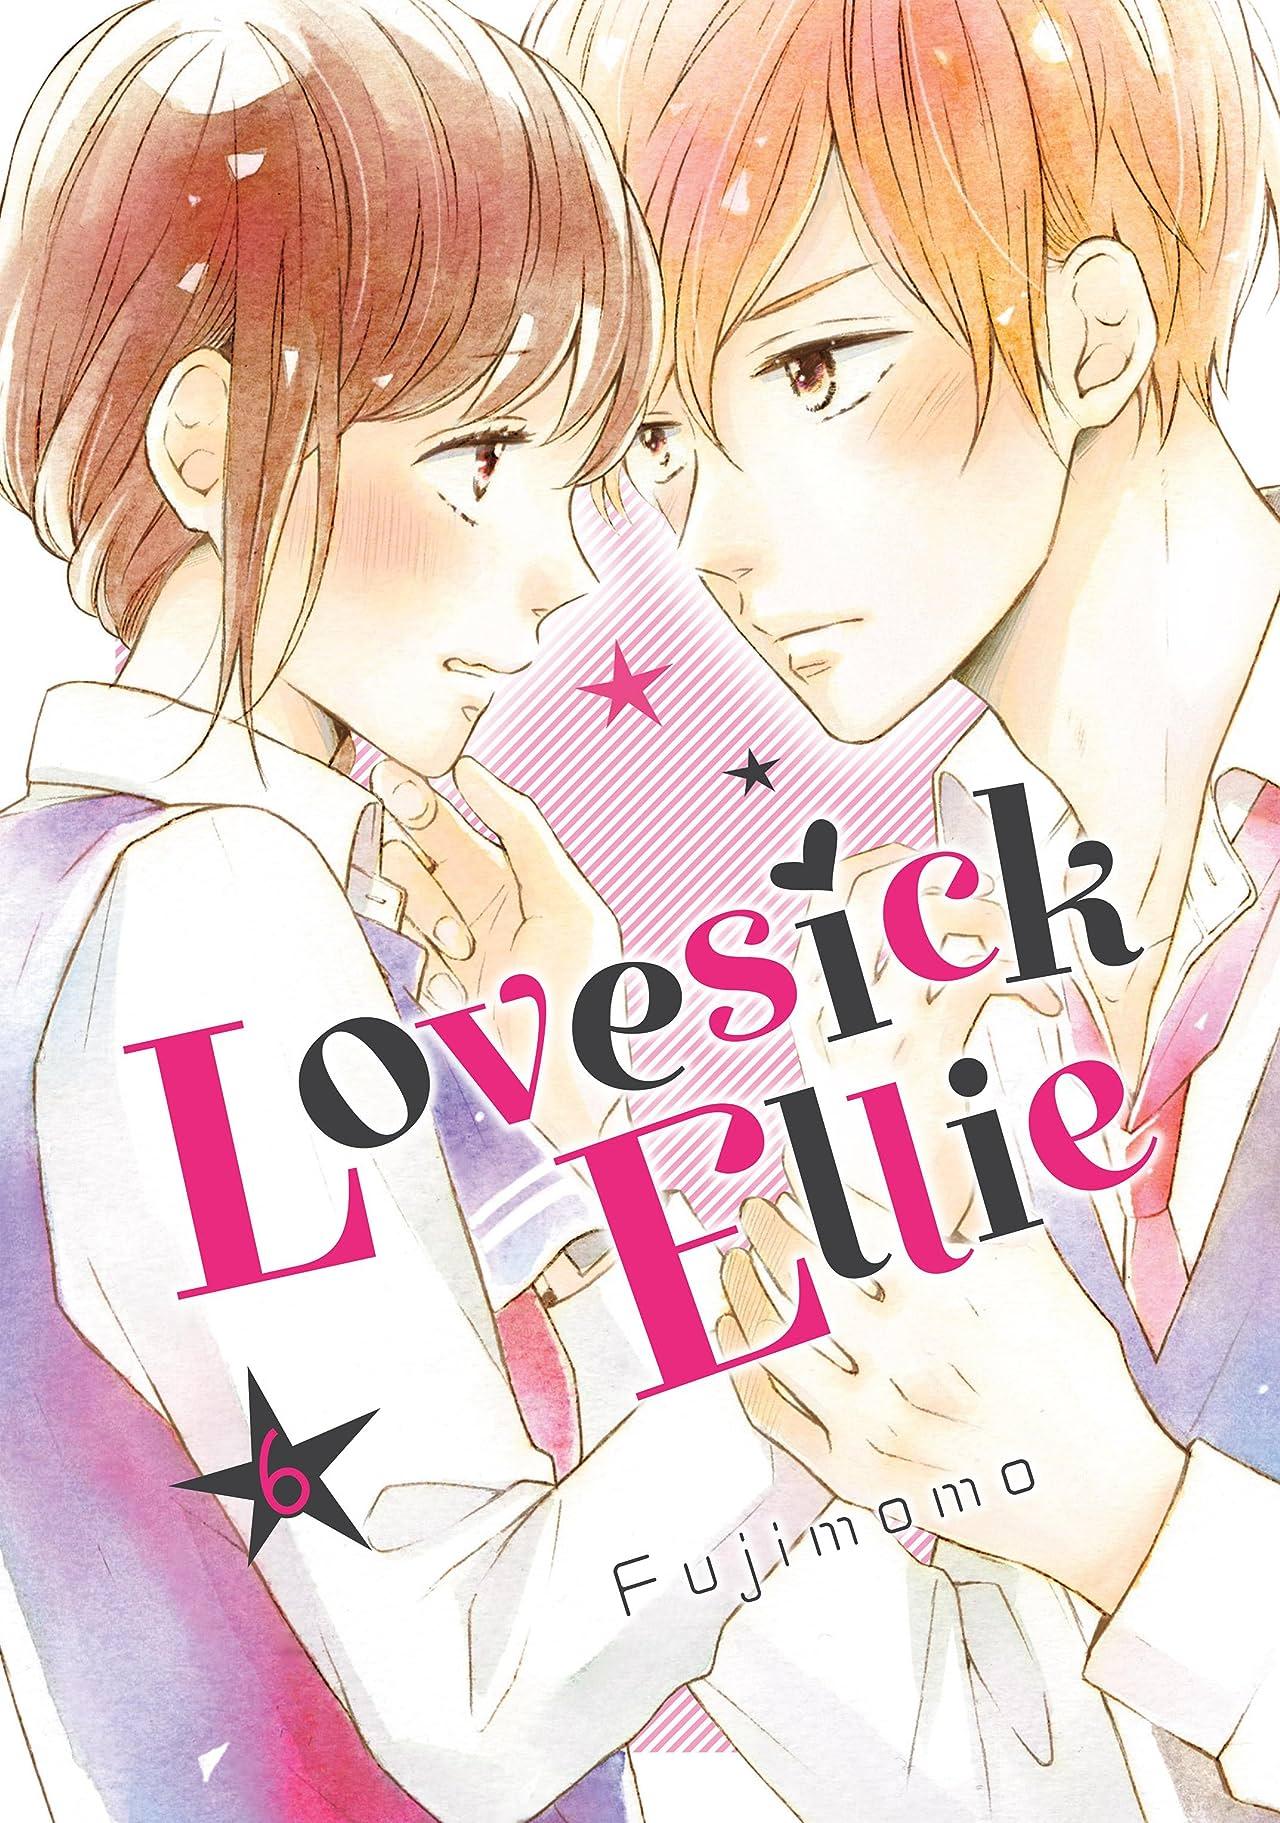 Lovesick Ellie Vol. 6